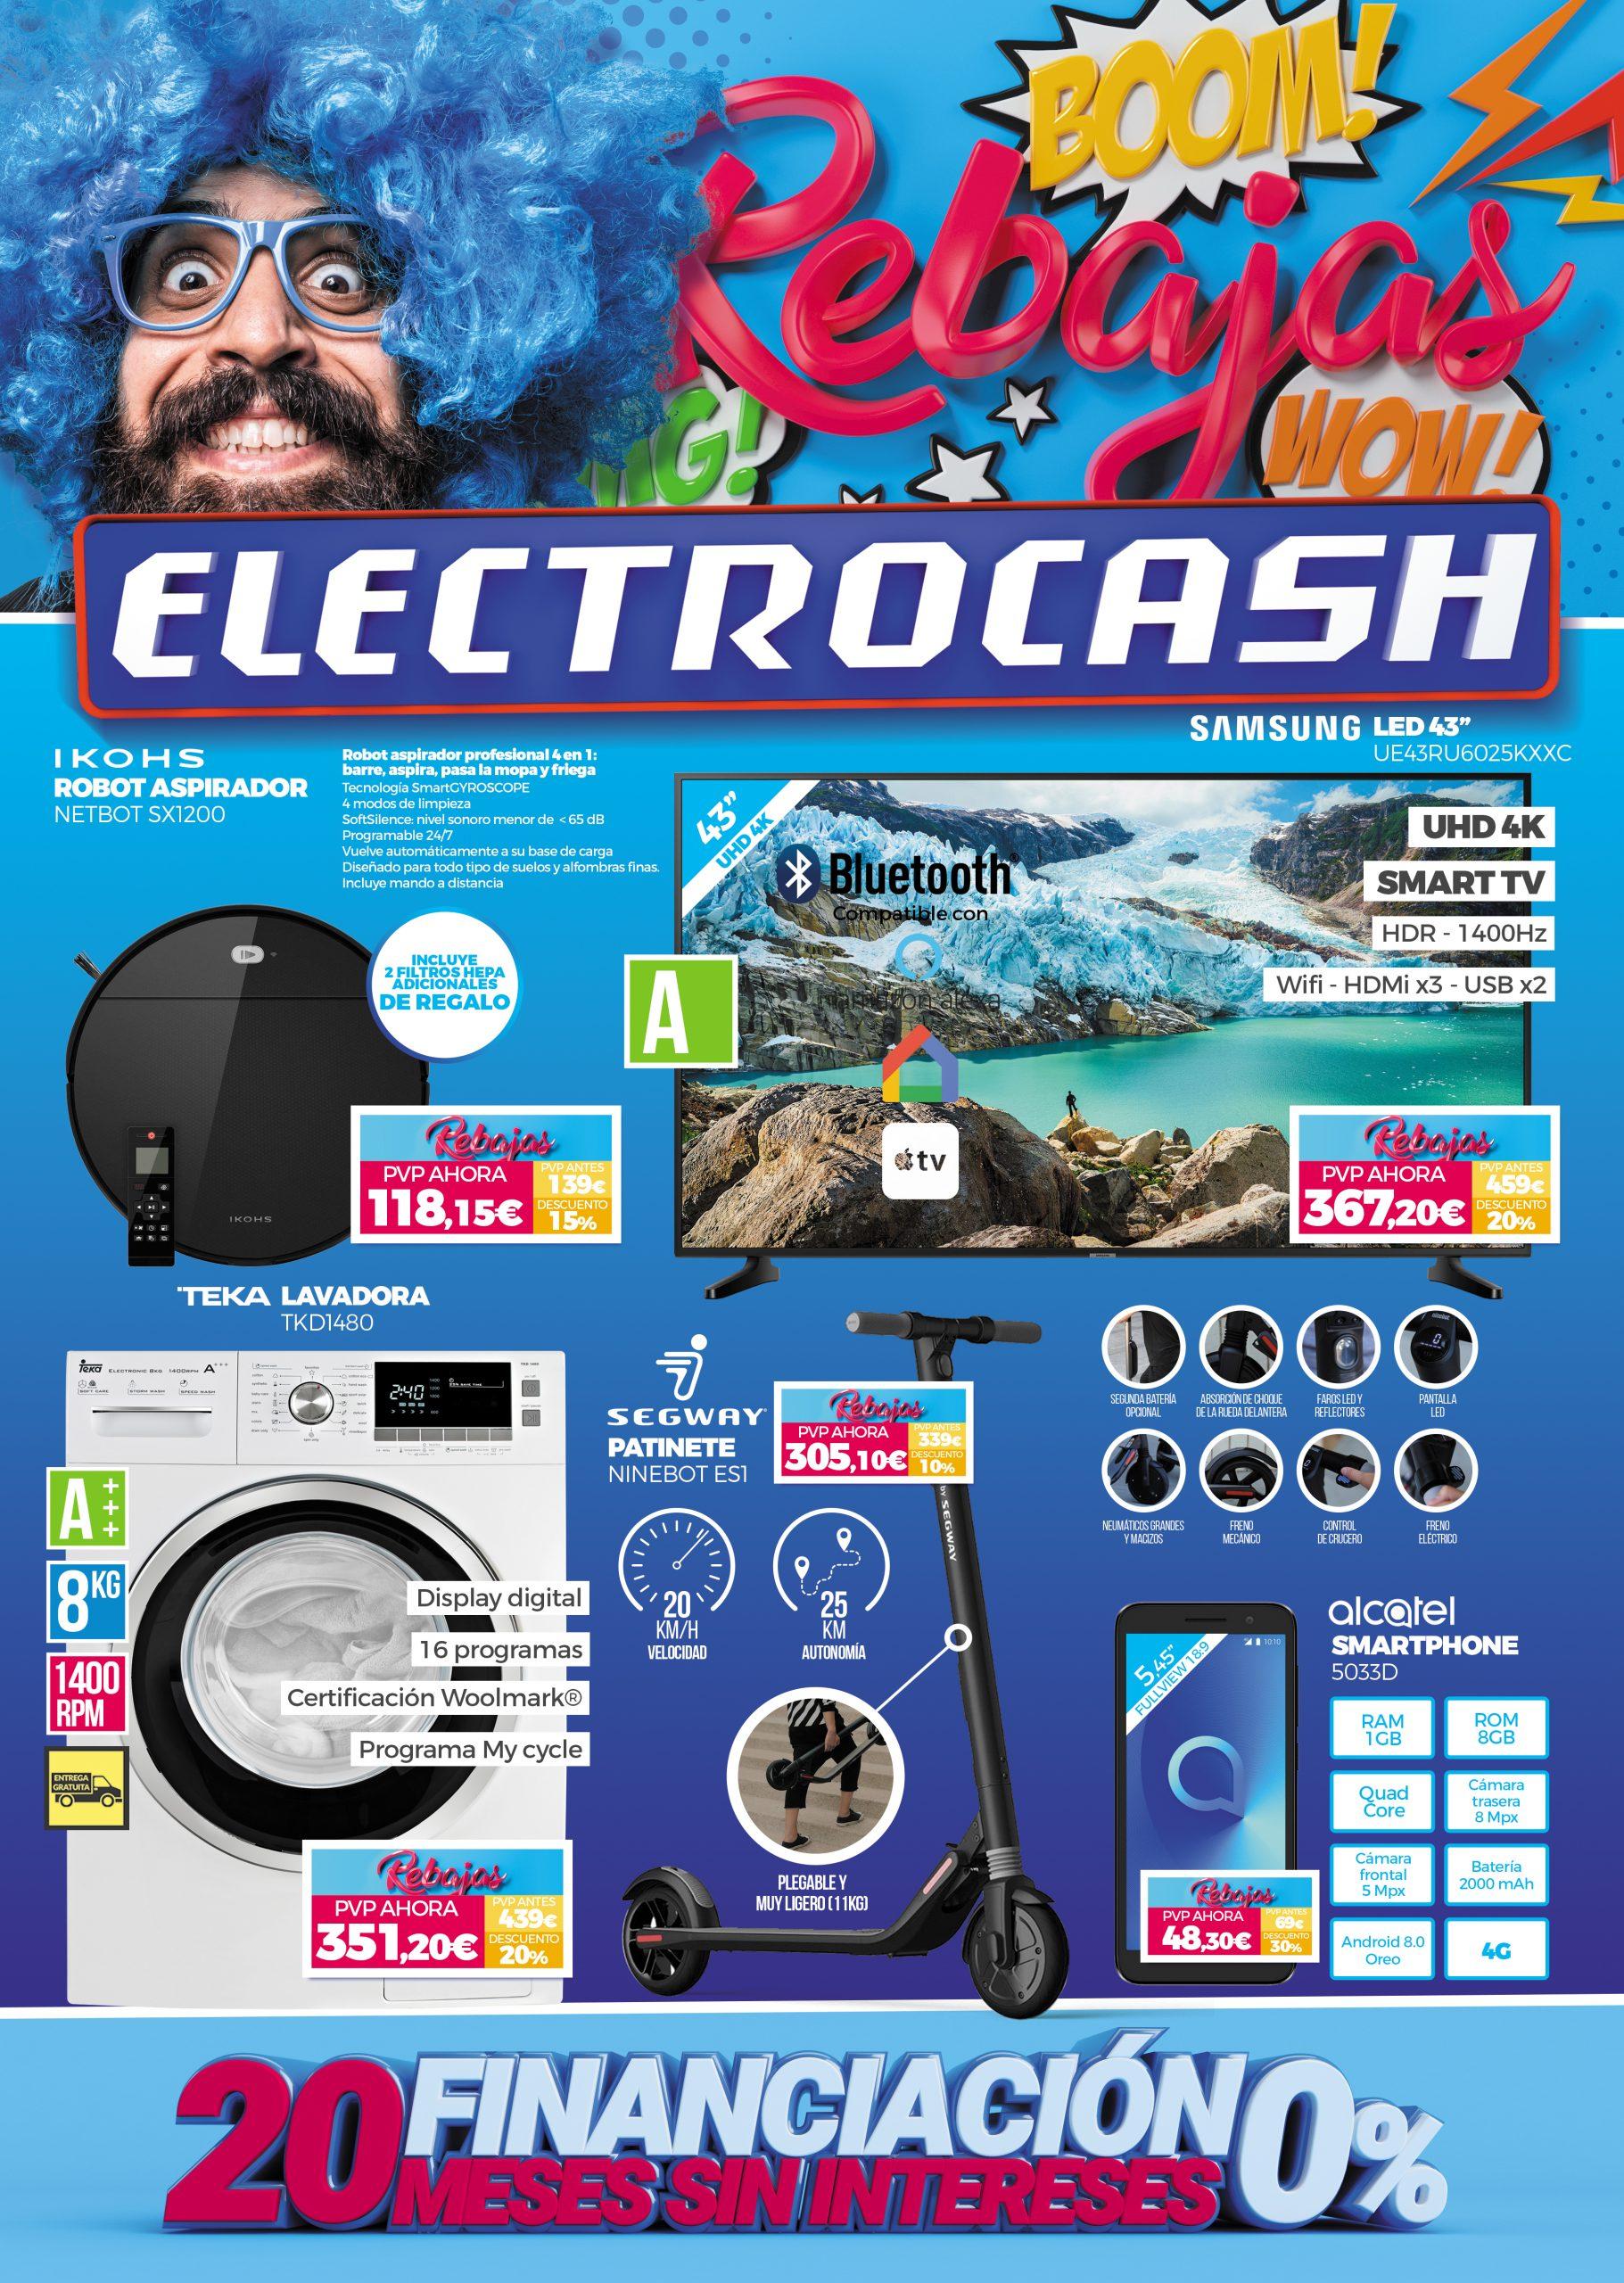 rebajas electrocash